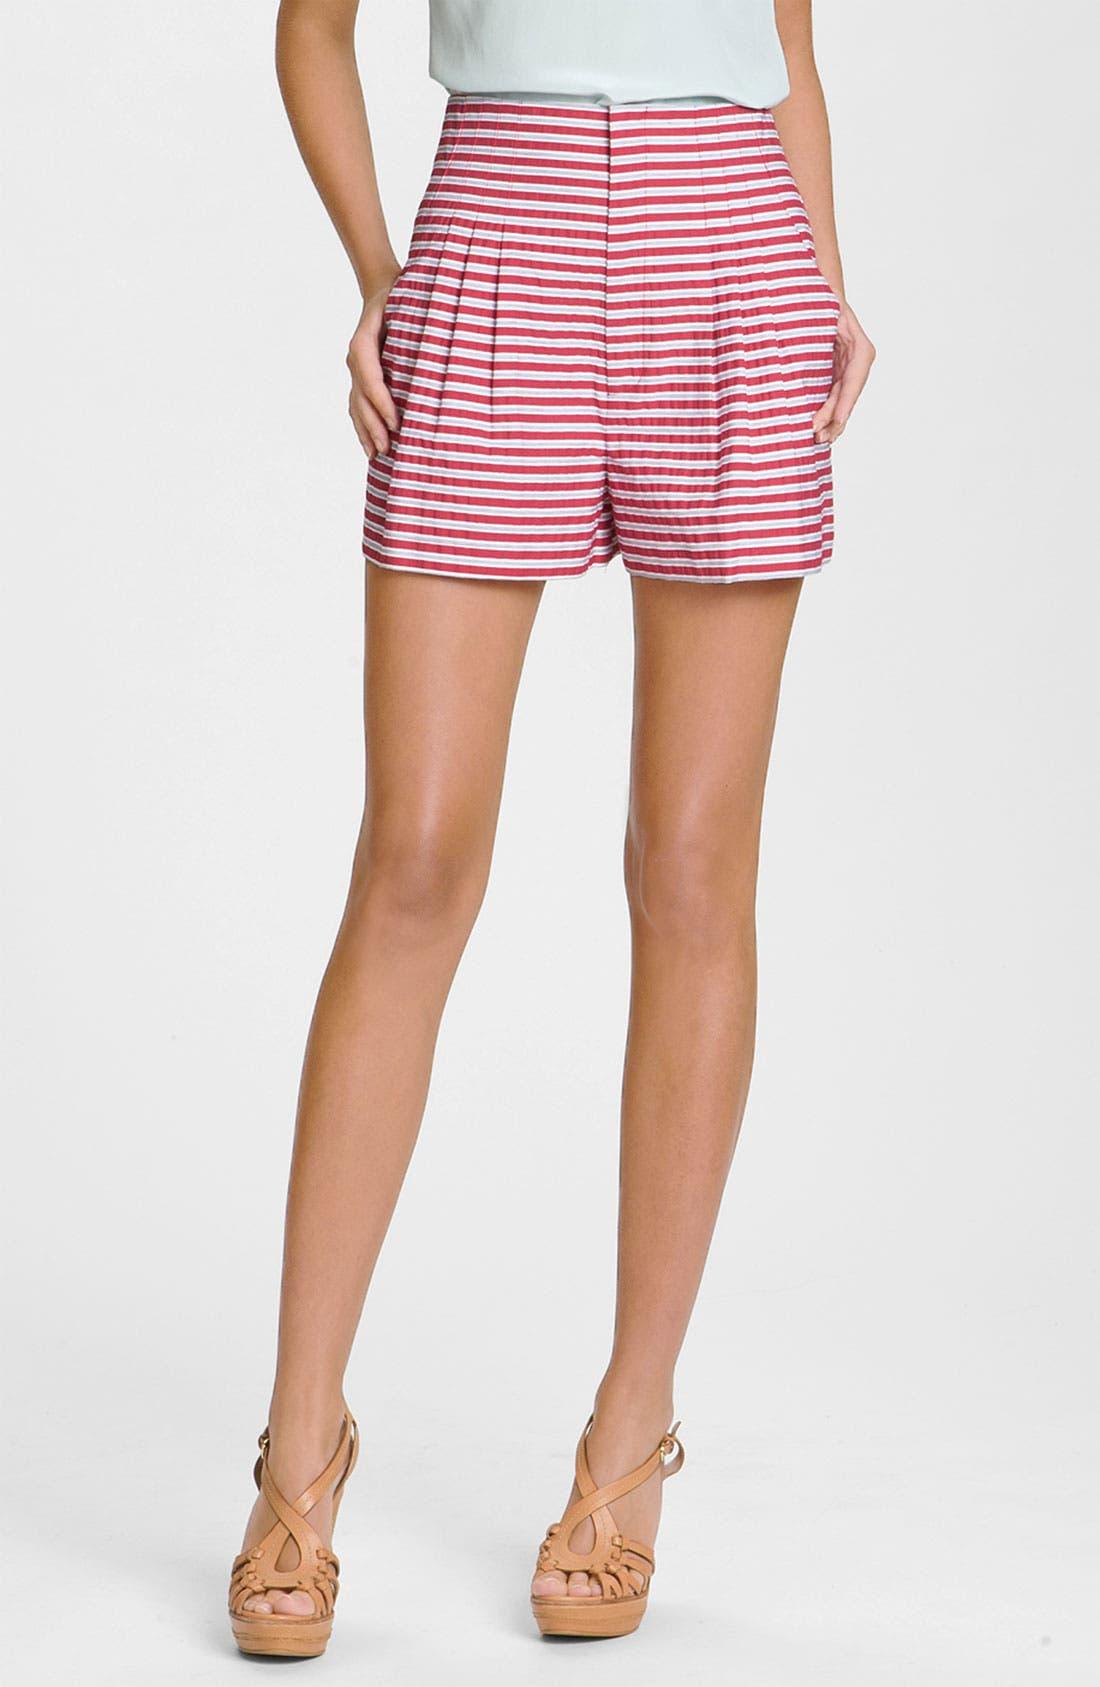 Alternate Image 1 Selected - Nanette Lepore 'Gold Rush' Striped Pleated Shorts